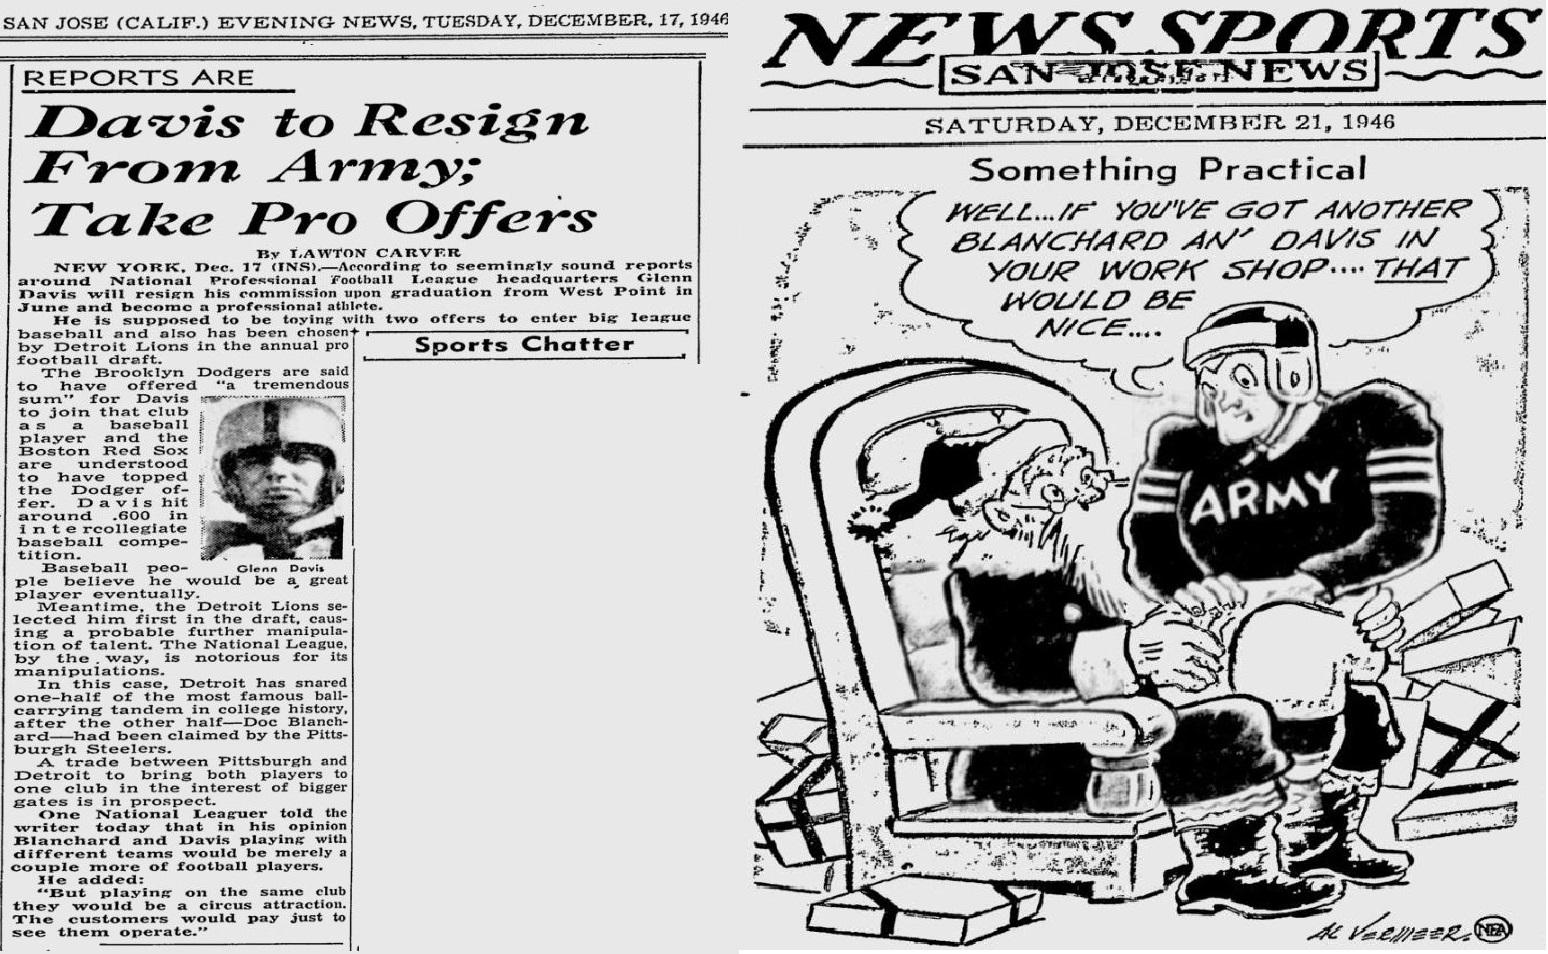 ArmyFB_1946_Davis-Pros_SanJoseEveningNews_Dec171946